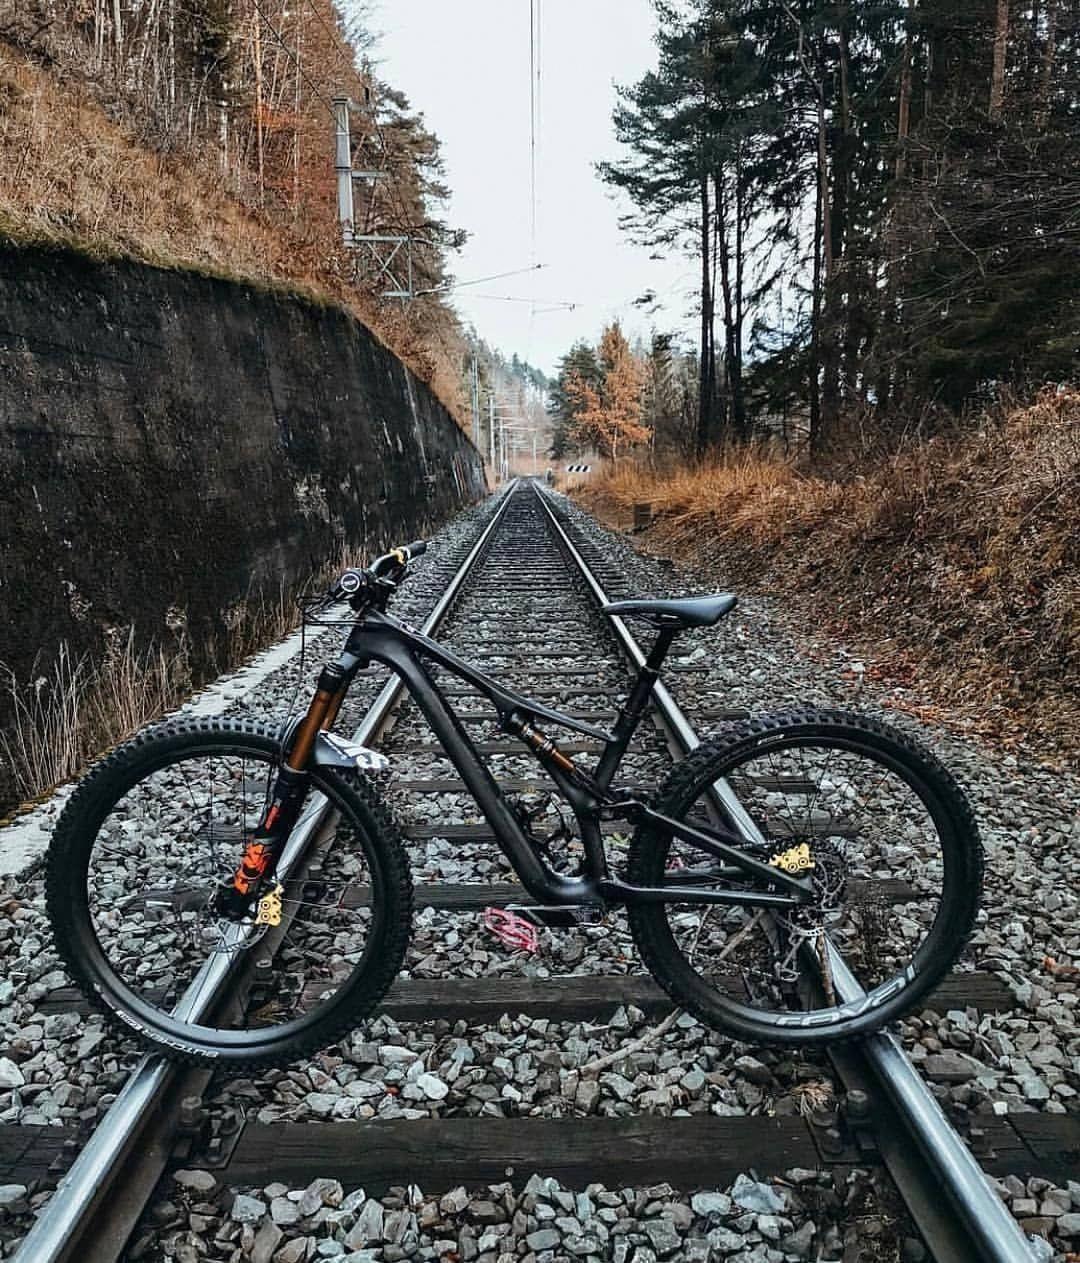 Types Of Bikes Mountain Biking Gear Mountain Biking Photography